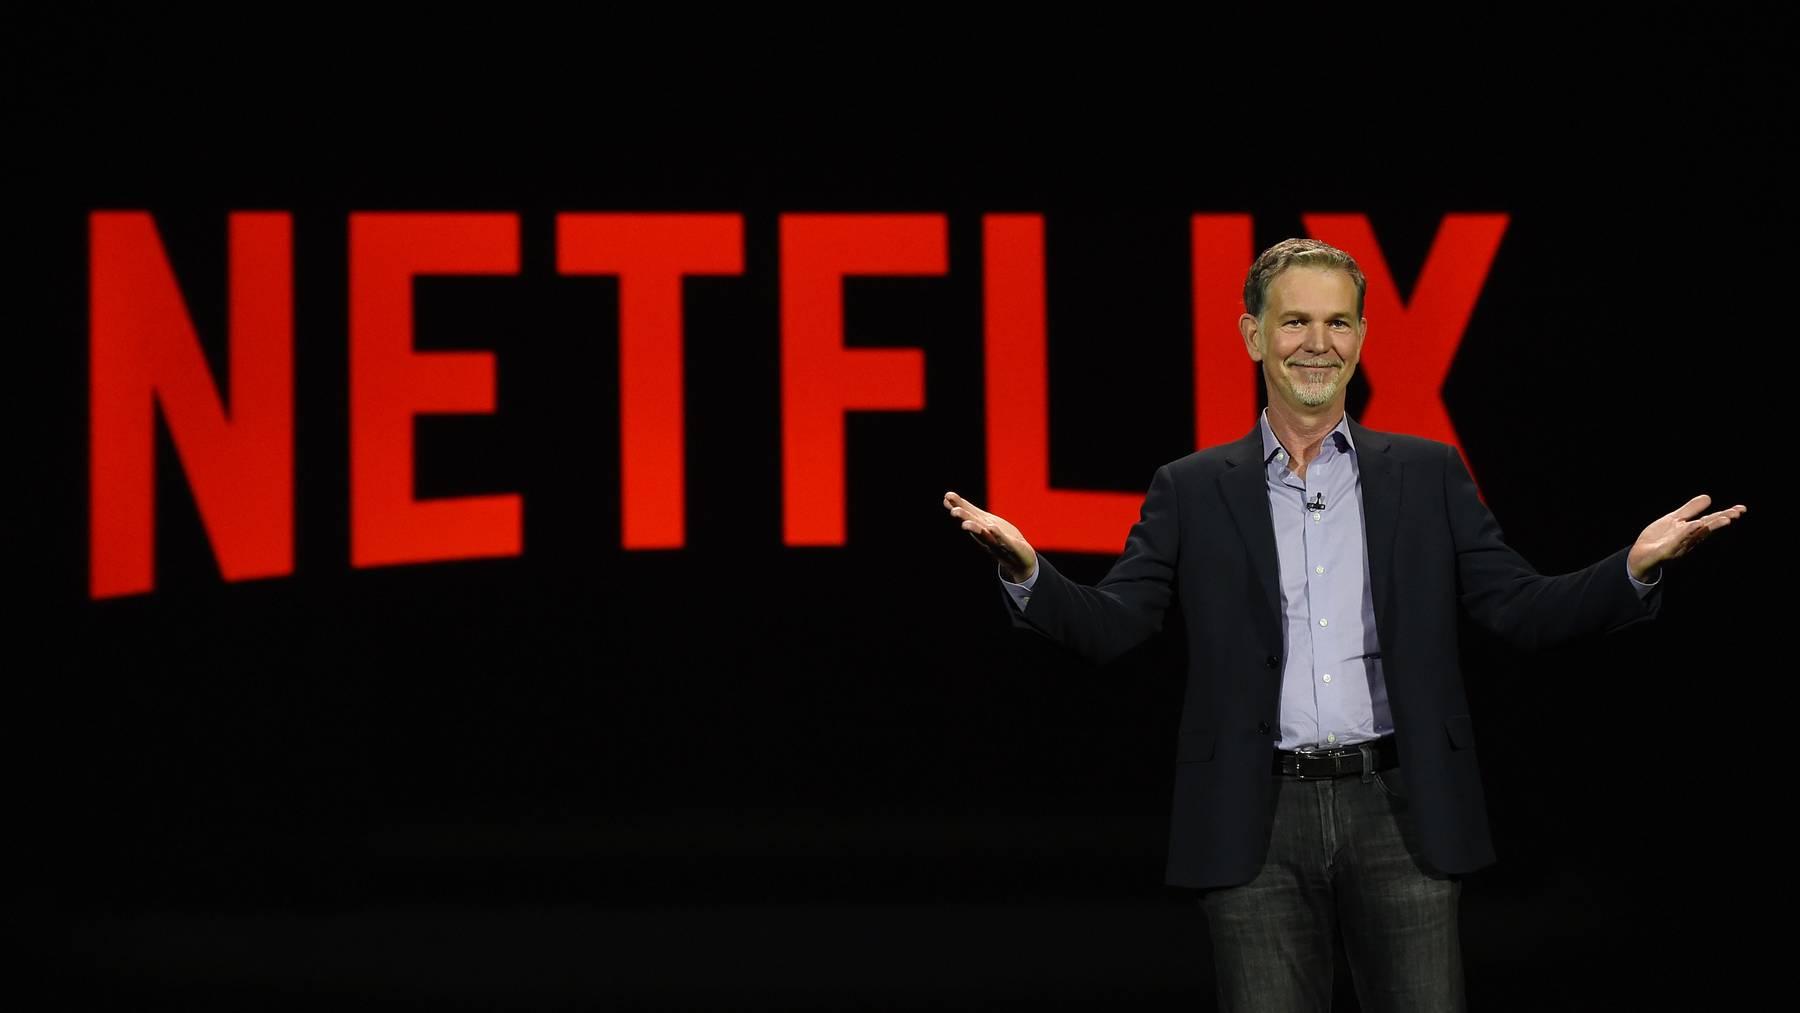 Netflix Hastings